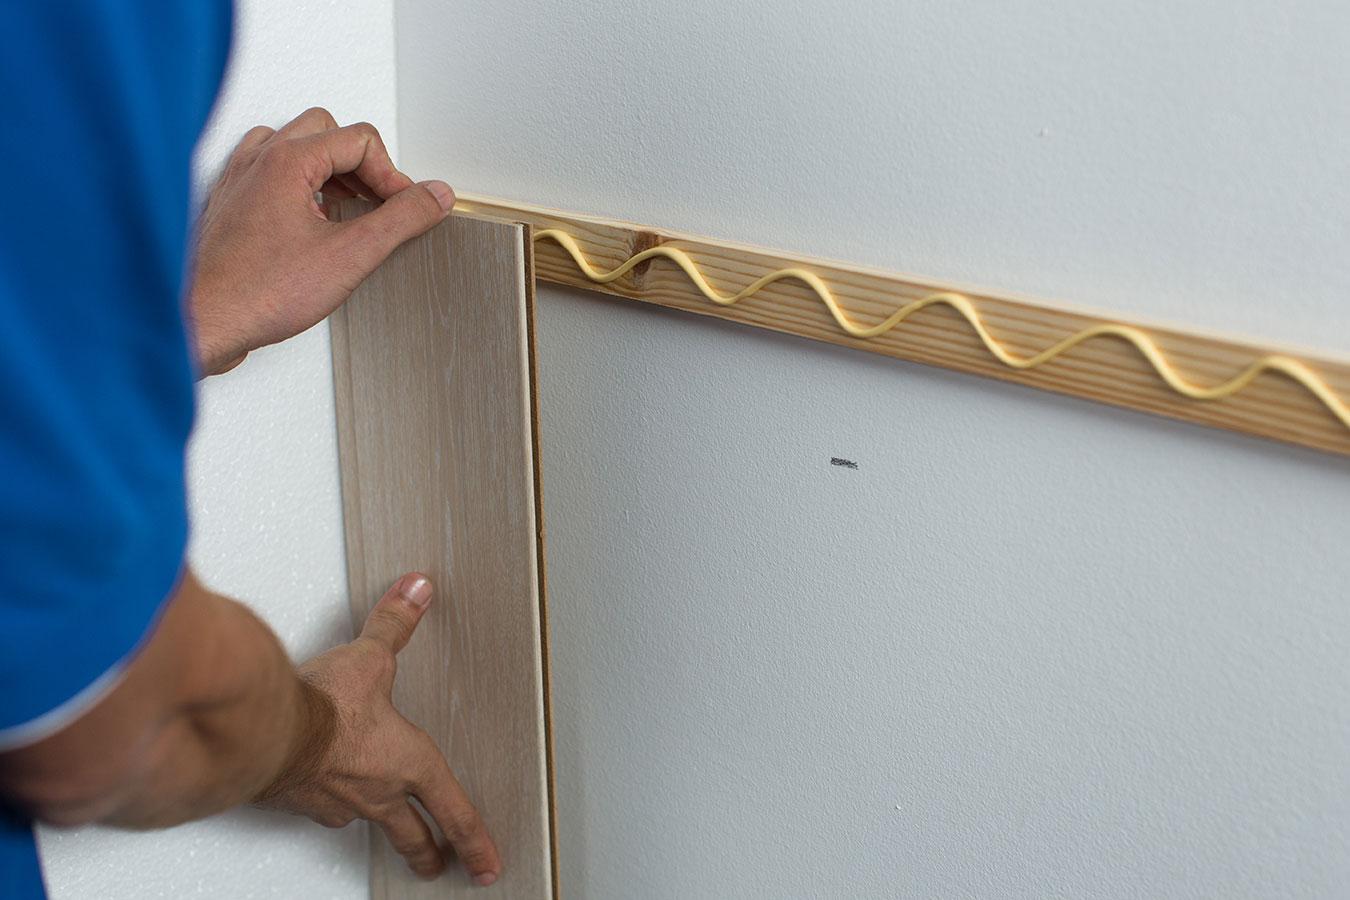 C mo colocar un friso de madera para decorar la pared ceys for Friso madera pared